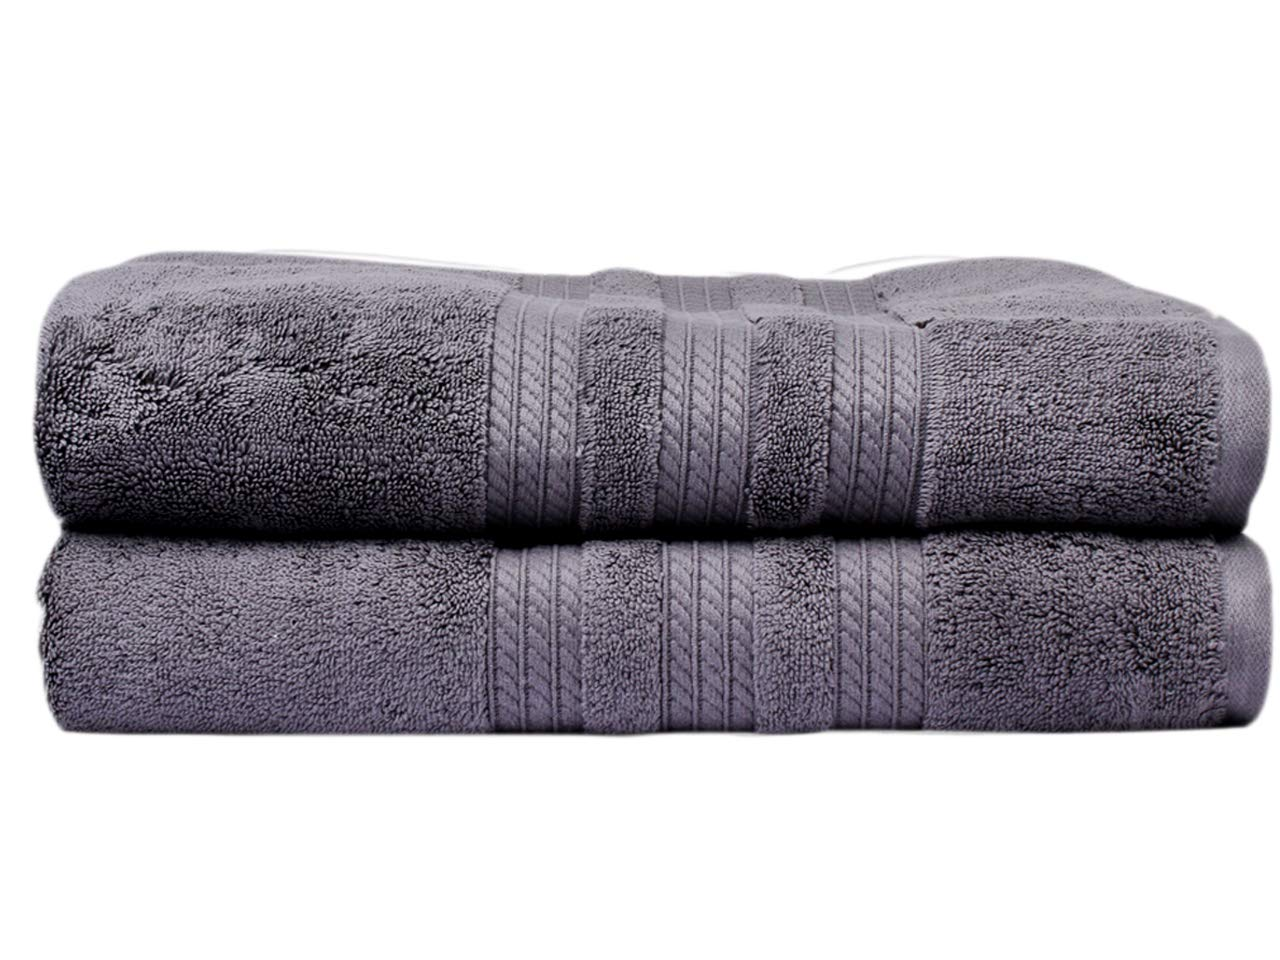 Divine 100% Ring-spun Cotton 720 GSM Premium Luxury Turkish Bath Towels - Extra Large (30 x 58 Inch) - Set of 2, Super Soft, Ultra Absorbent, Machine Washable, Eco Friendly, Plush SPA/Hotel Quality